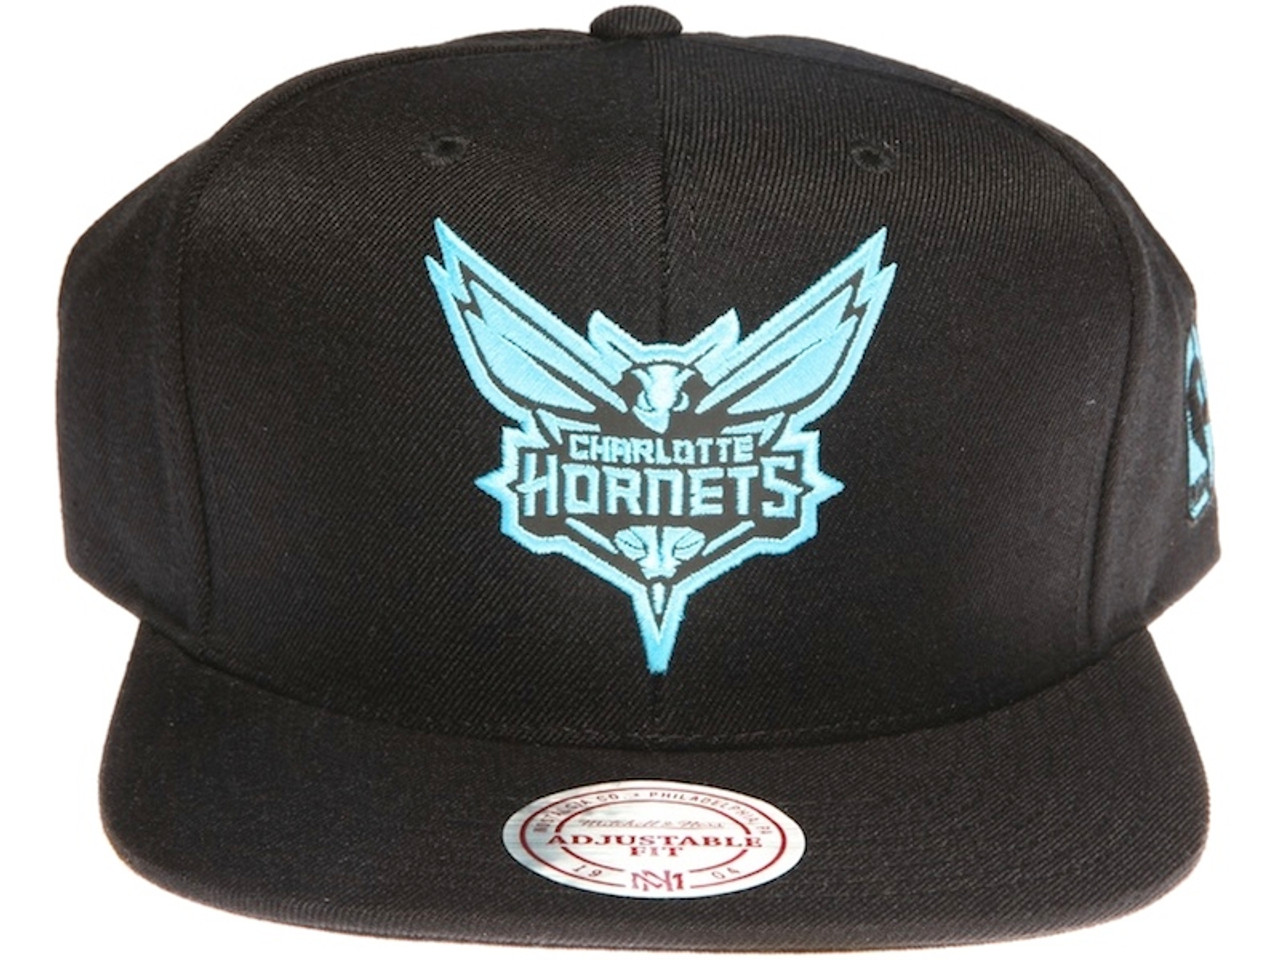 df9b91ba8 ... canada charlotte hornets reflective logo mitchell ness nba black  snapback hat e1c66 deafc